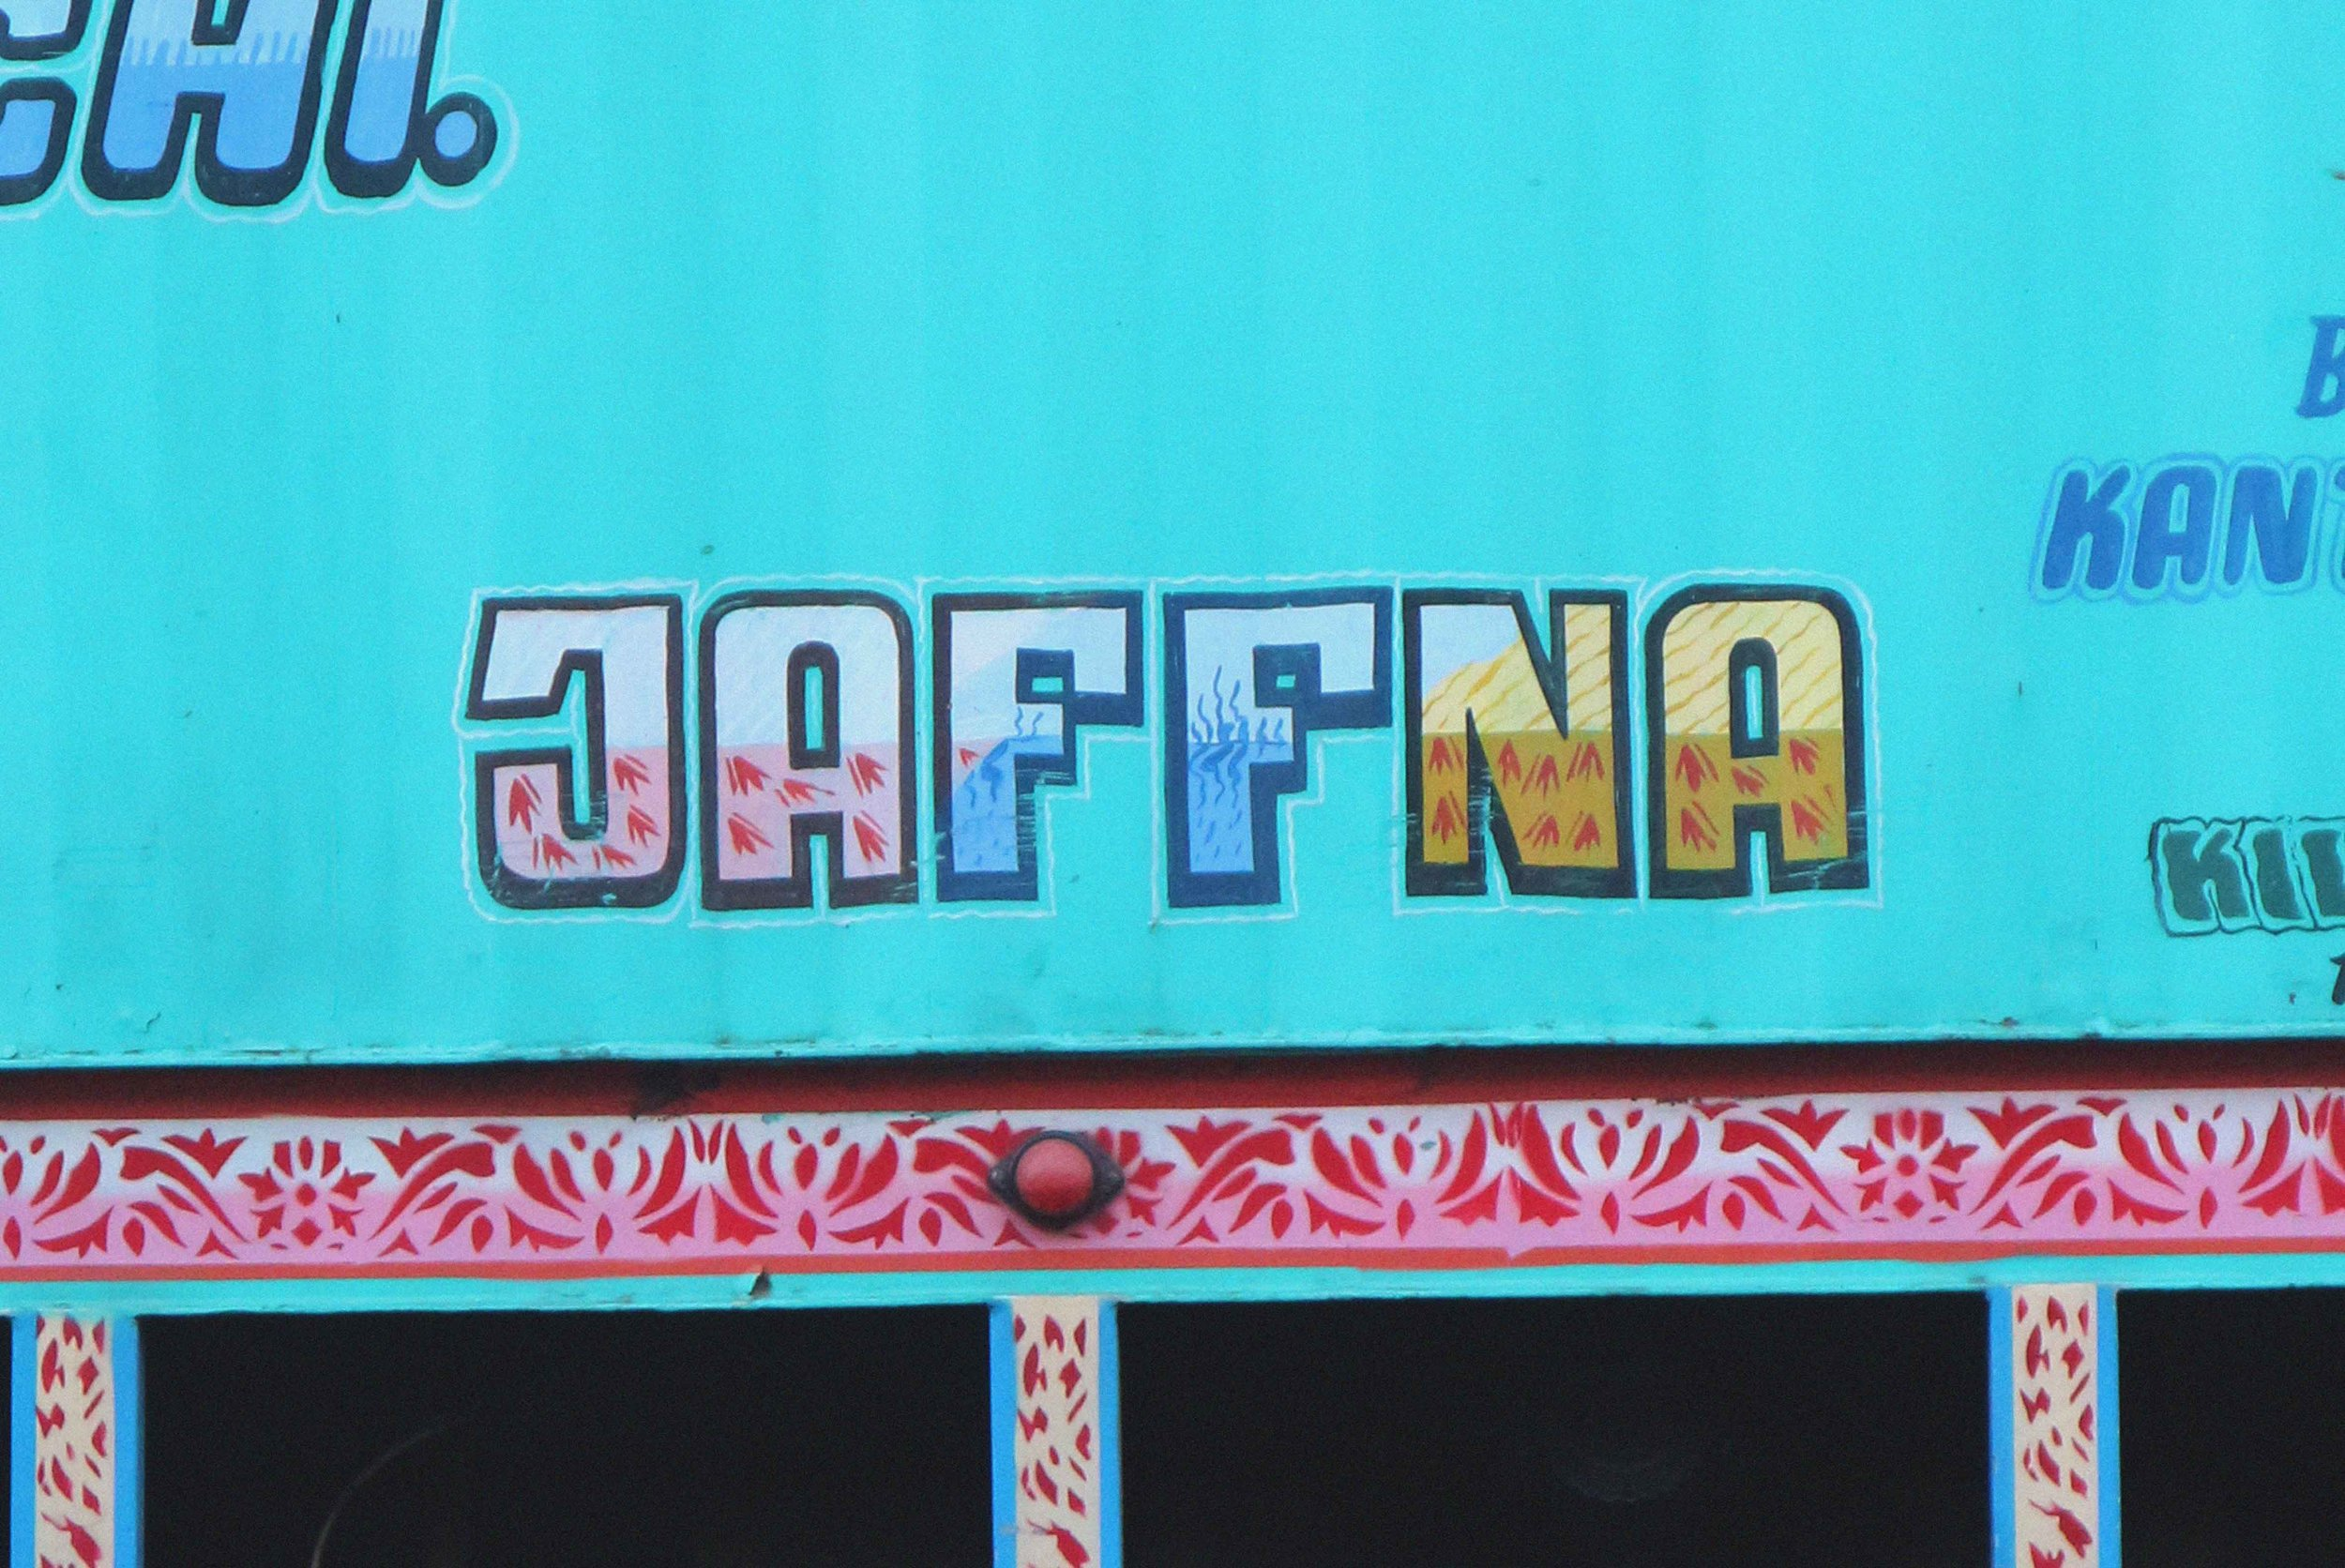 'Jaffna' painted